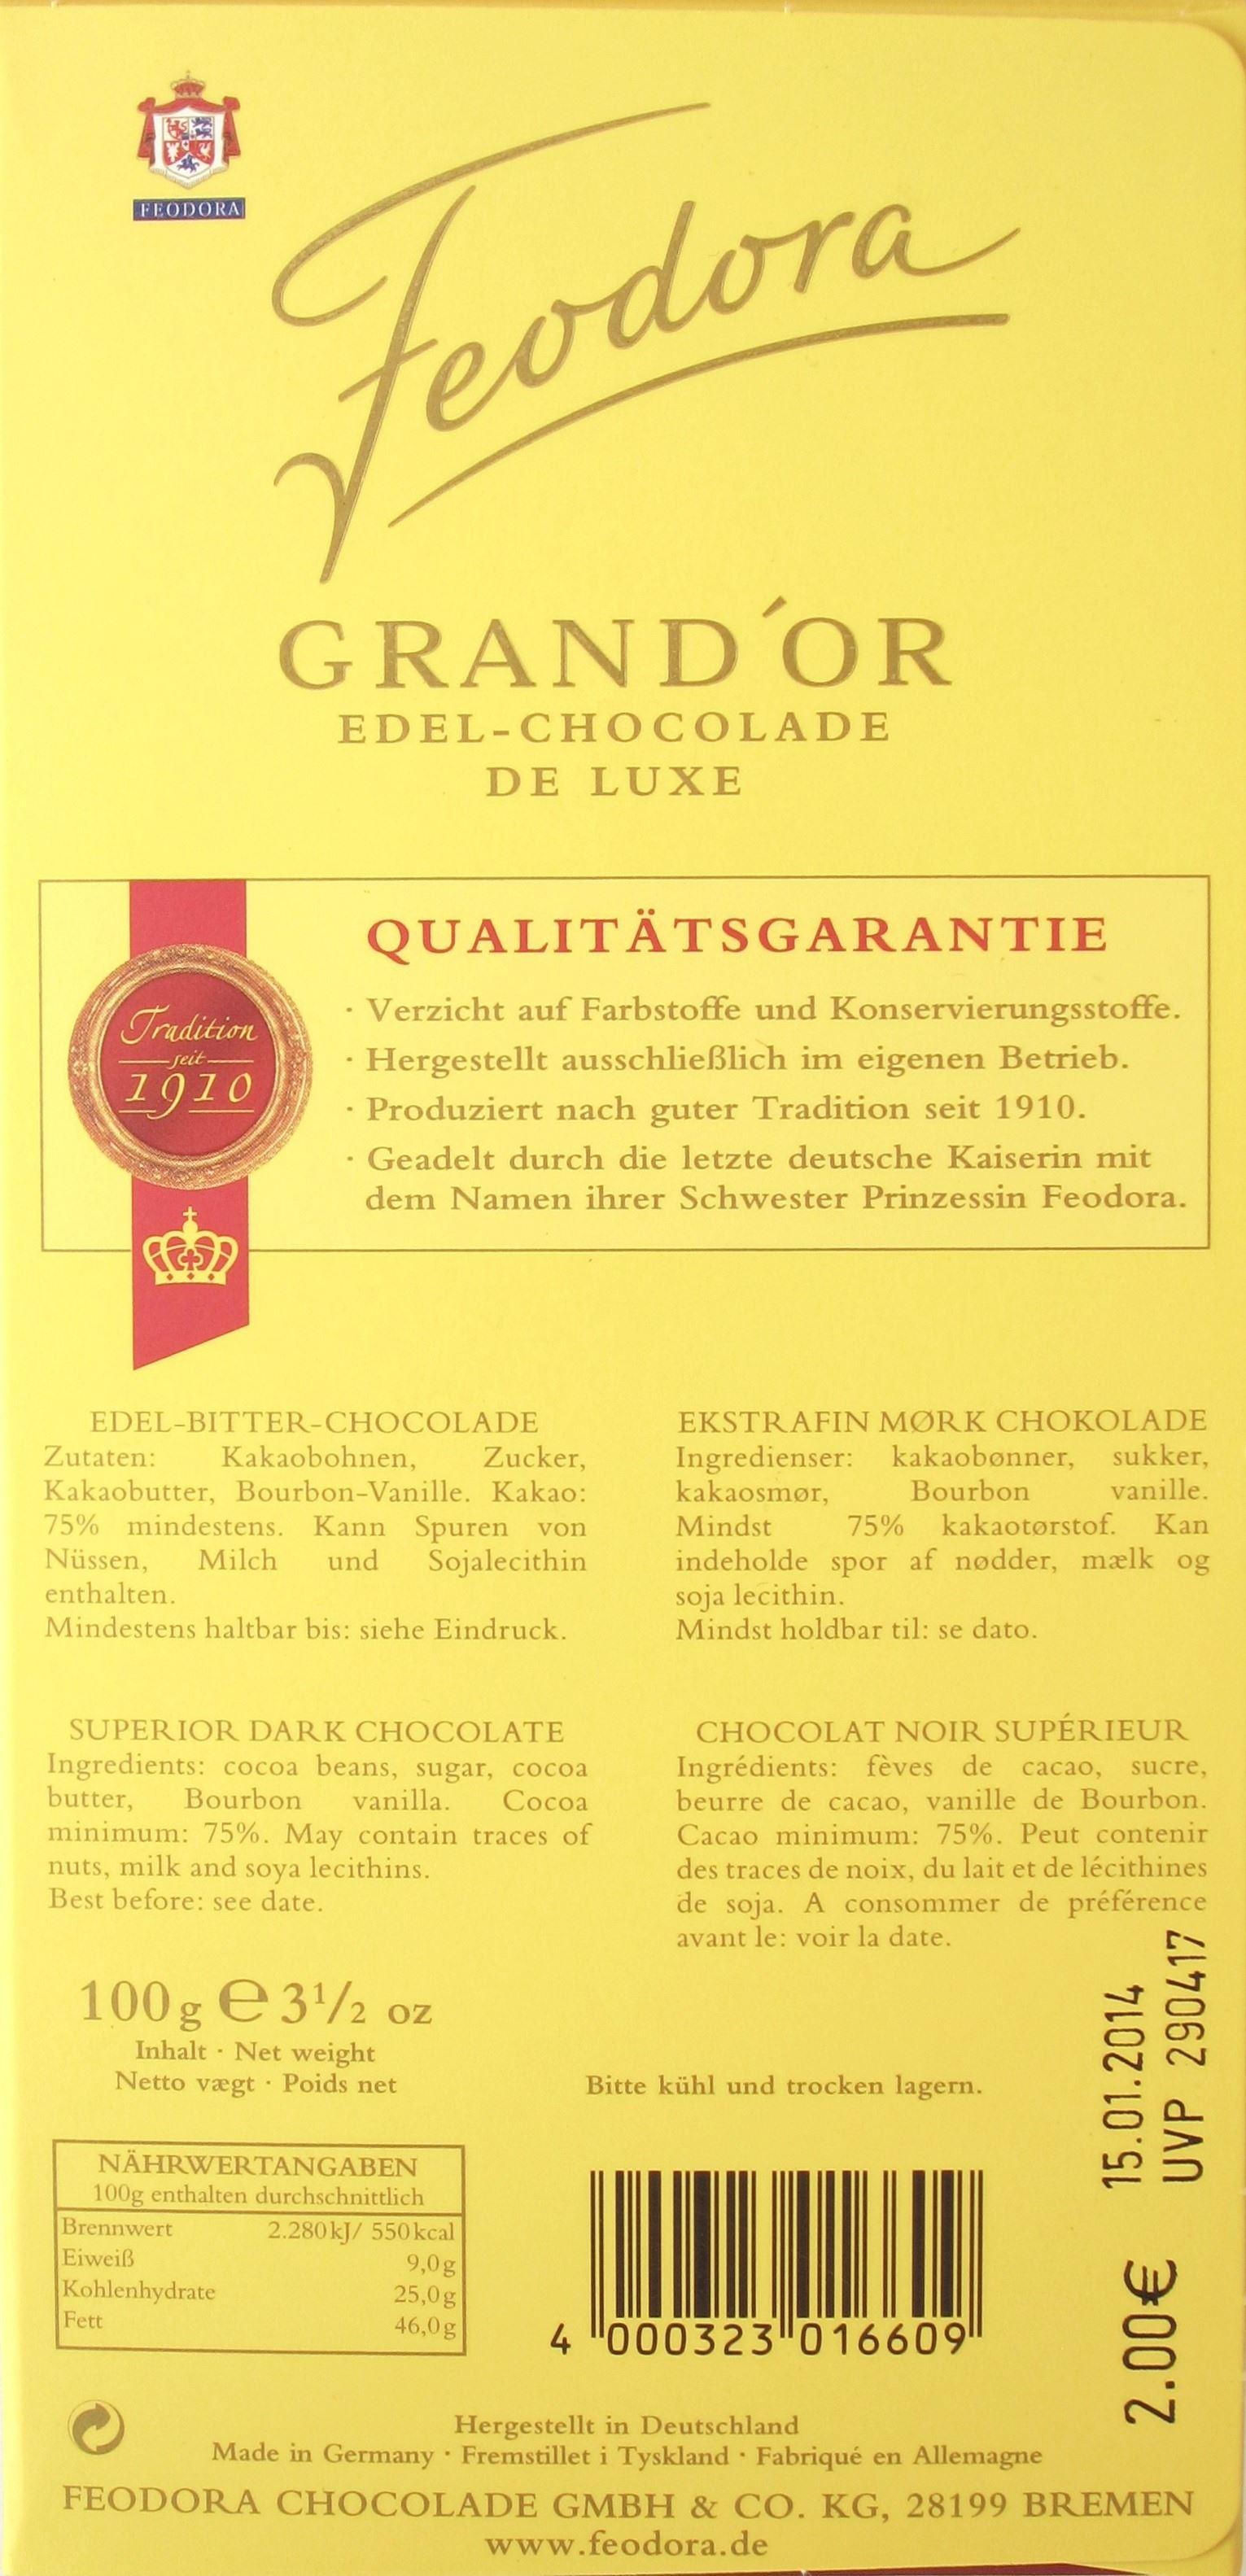 Feodora Grand'Or Milde Edel-Bitter Edel-Chocolade - Inhaltsangaben